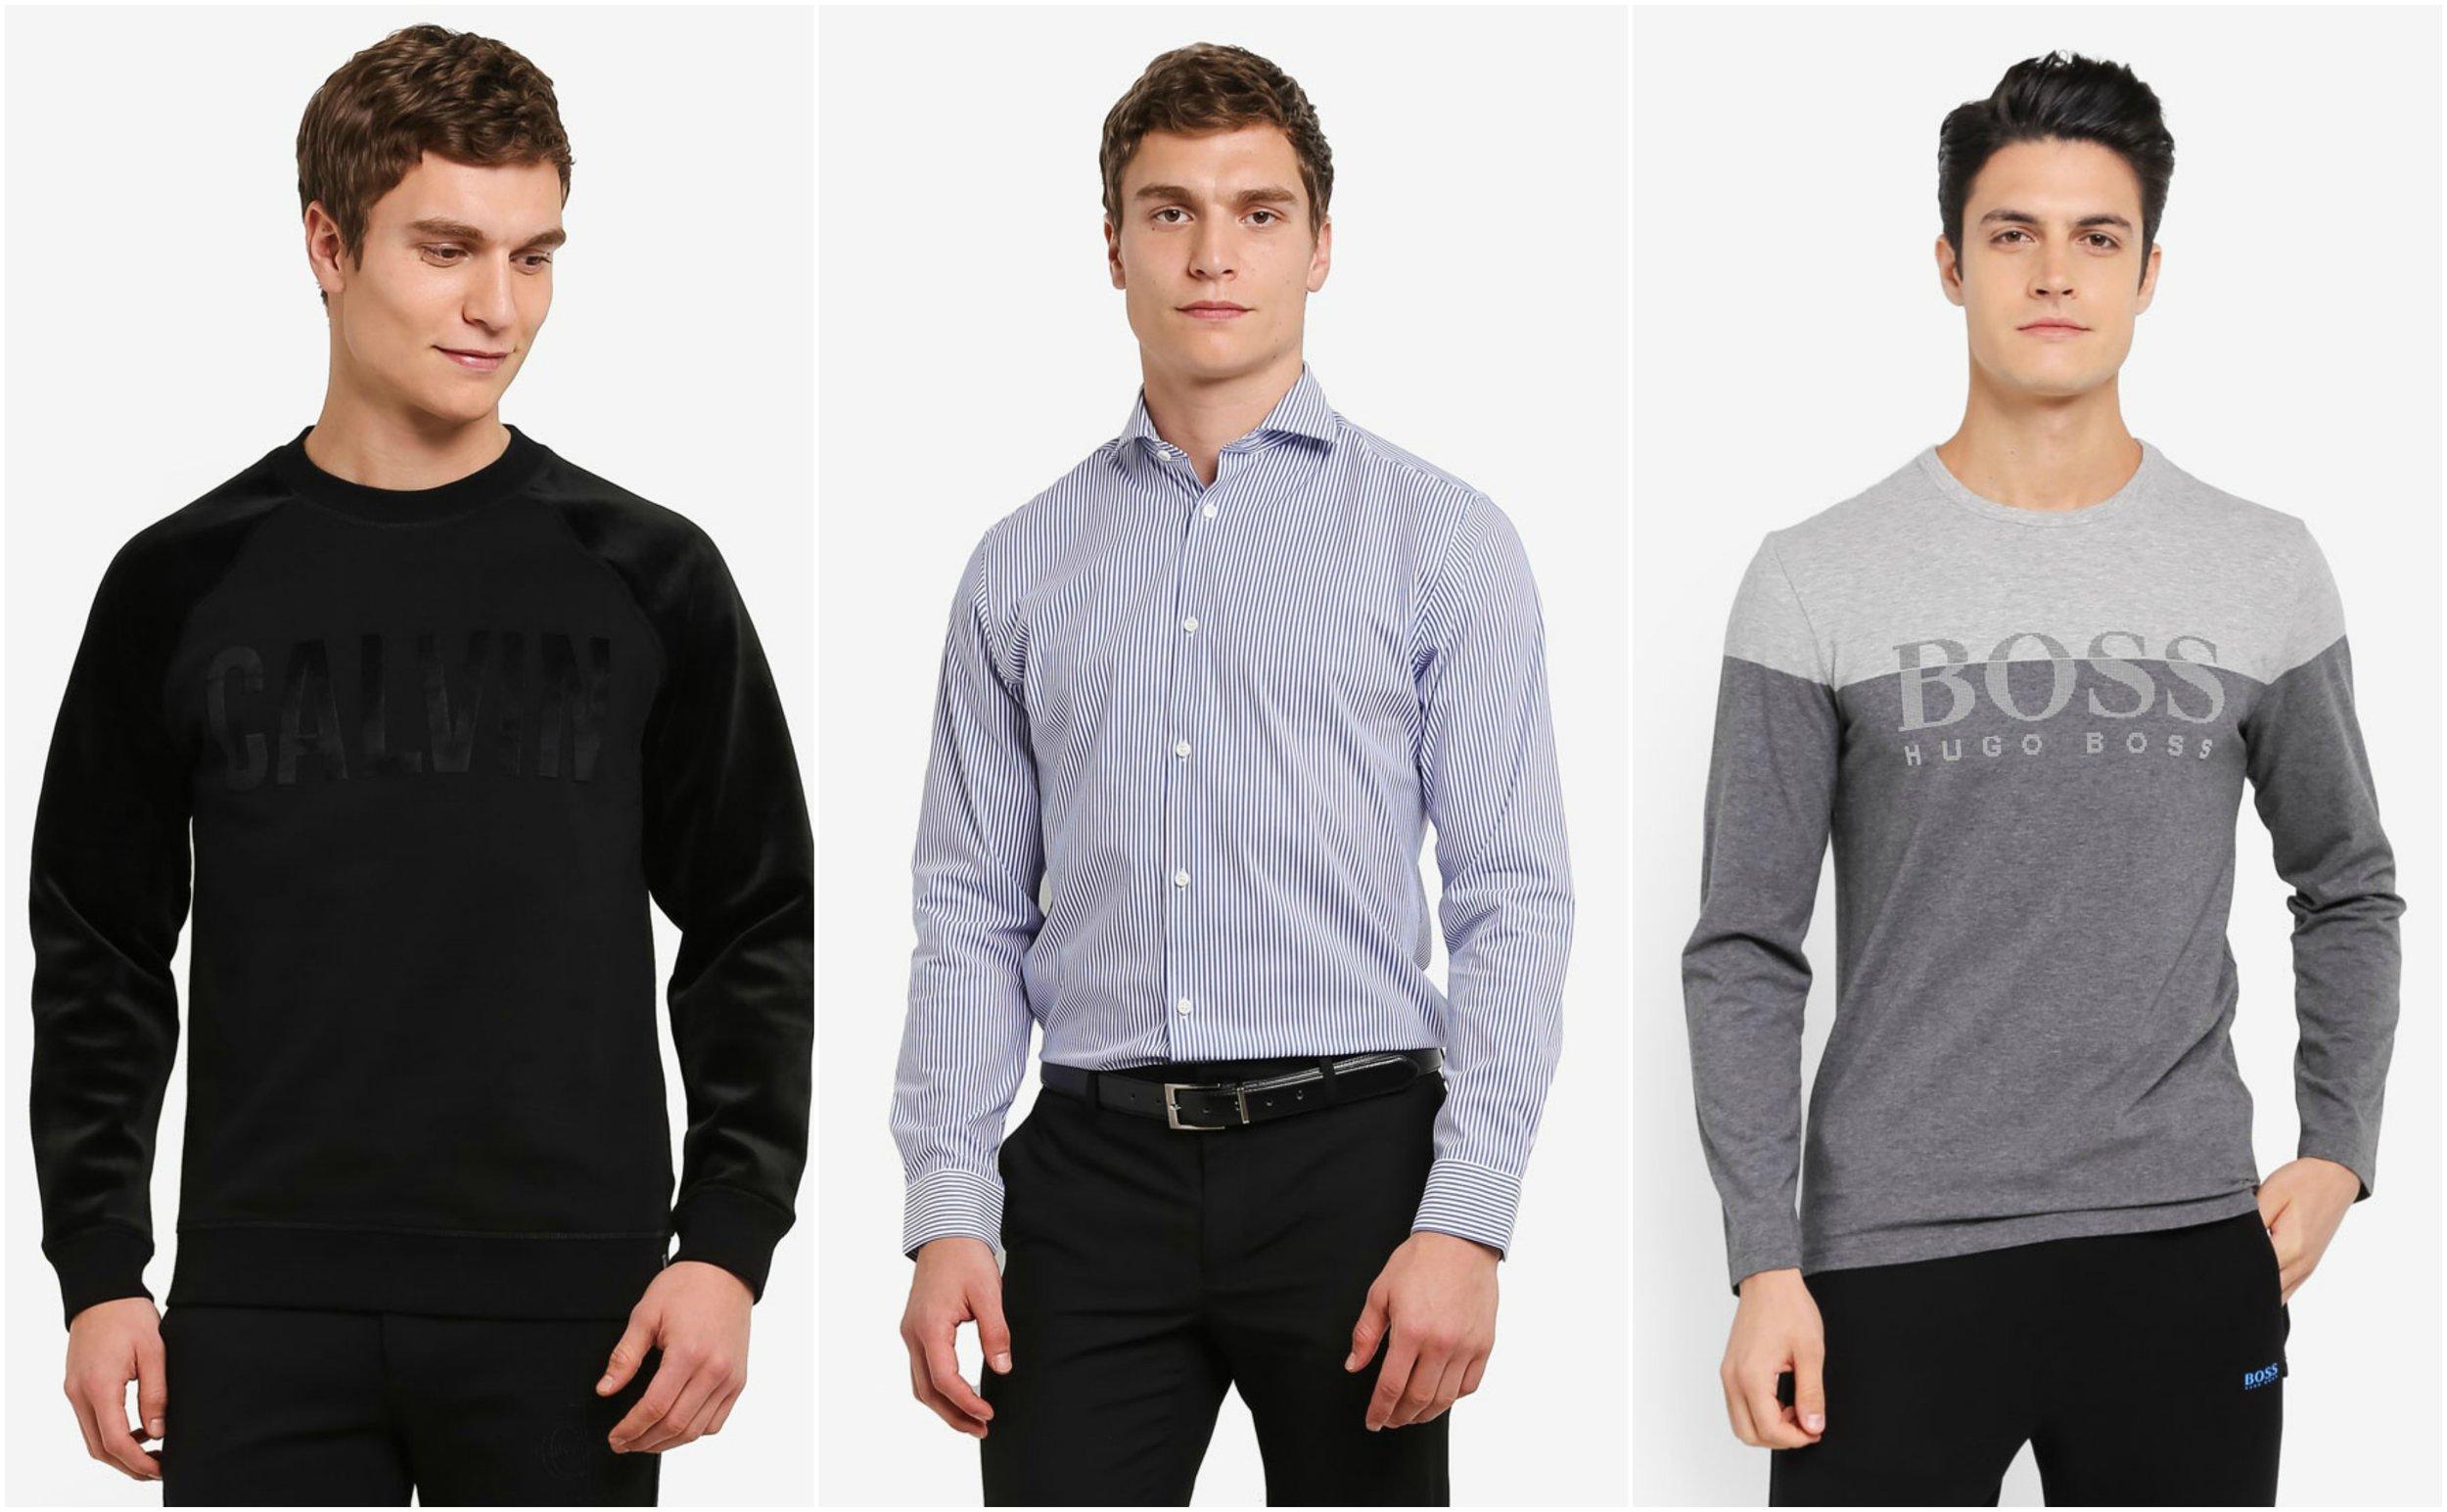 1. Hego 1 Crew Neck Knit Sweatshirt - Calvin Klein Jeans , 2.  SELECTED HOMME Shdonesel-Mon Shirt , 3.  BOSS Togn 2 T-Shirt